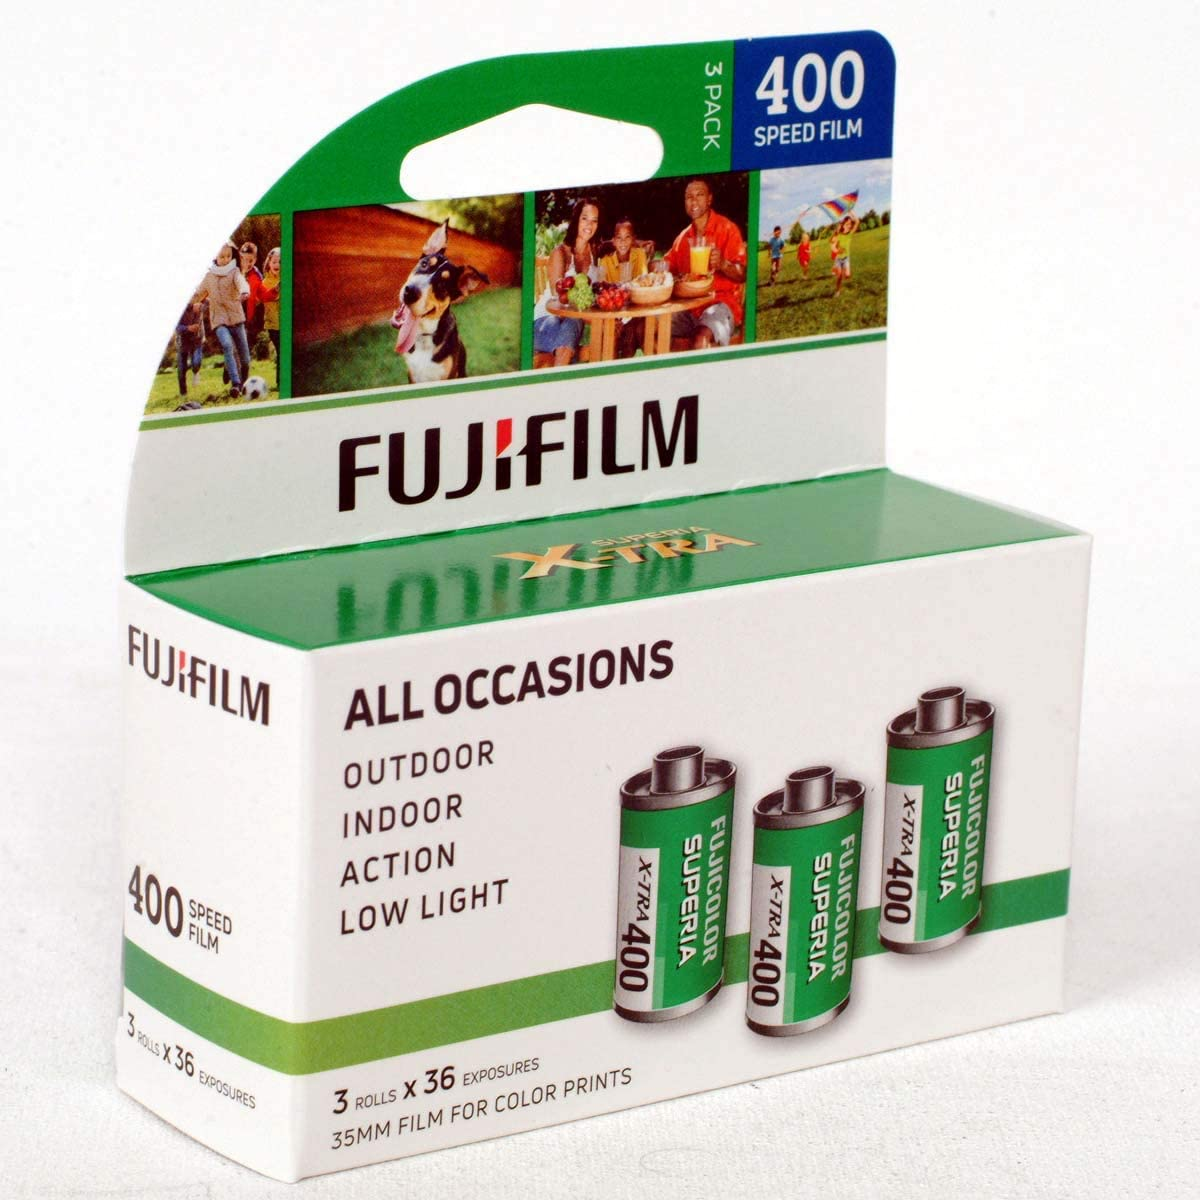 Fujifilm Fuji Superia X-TRA 400 película negativa de color 35 mm Roll, 24 exposiciones